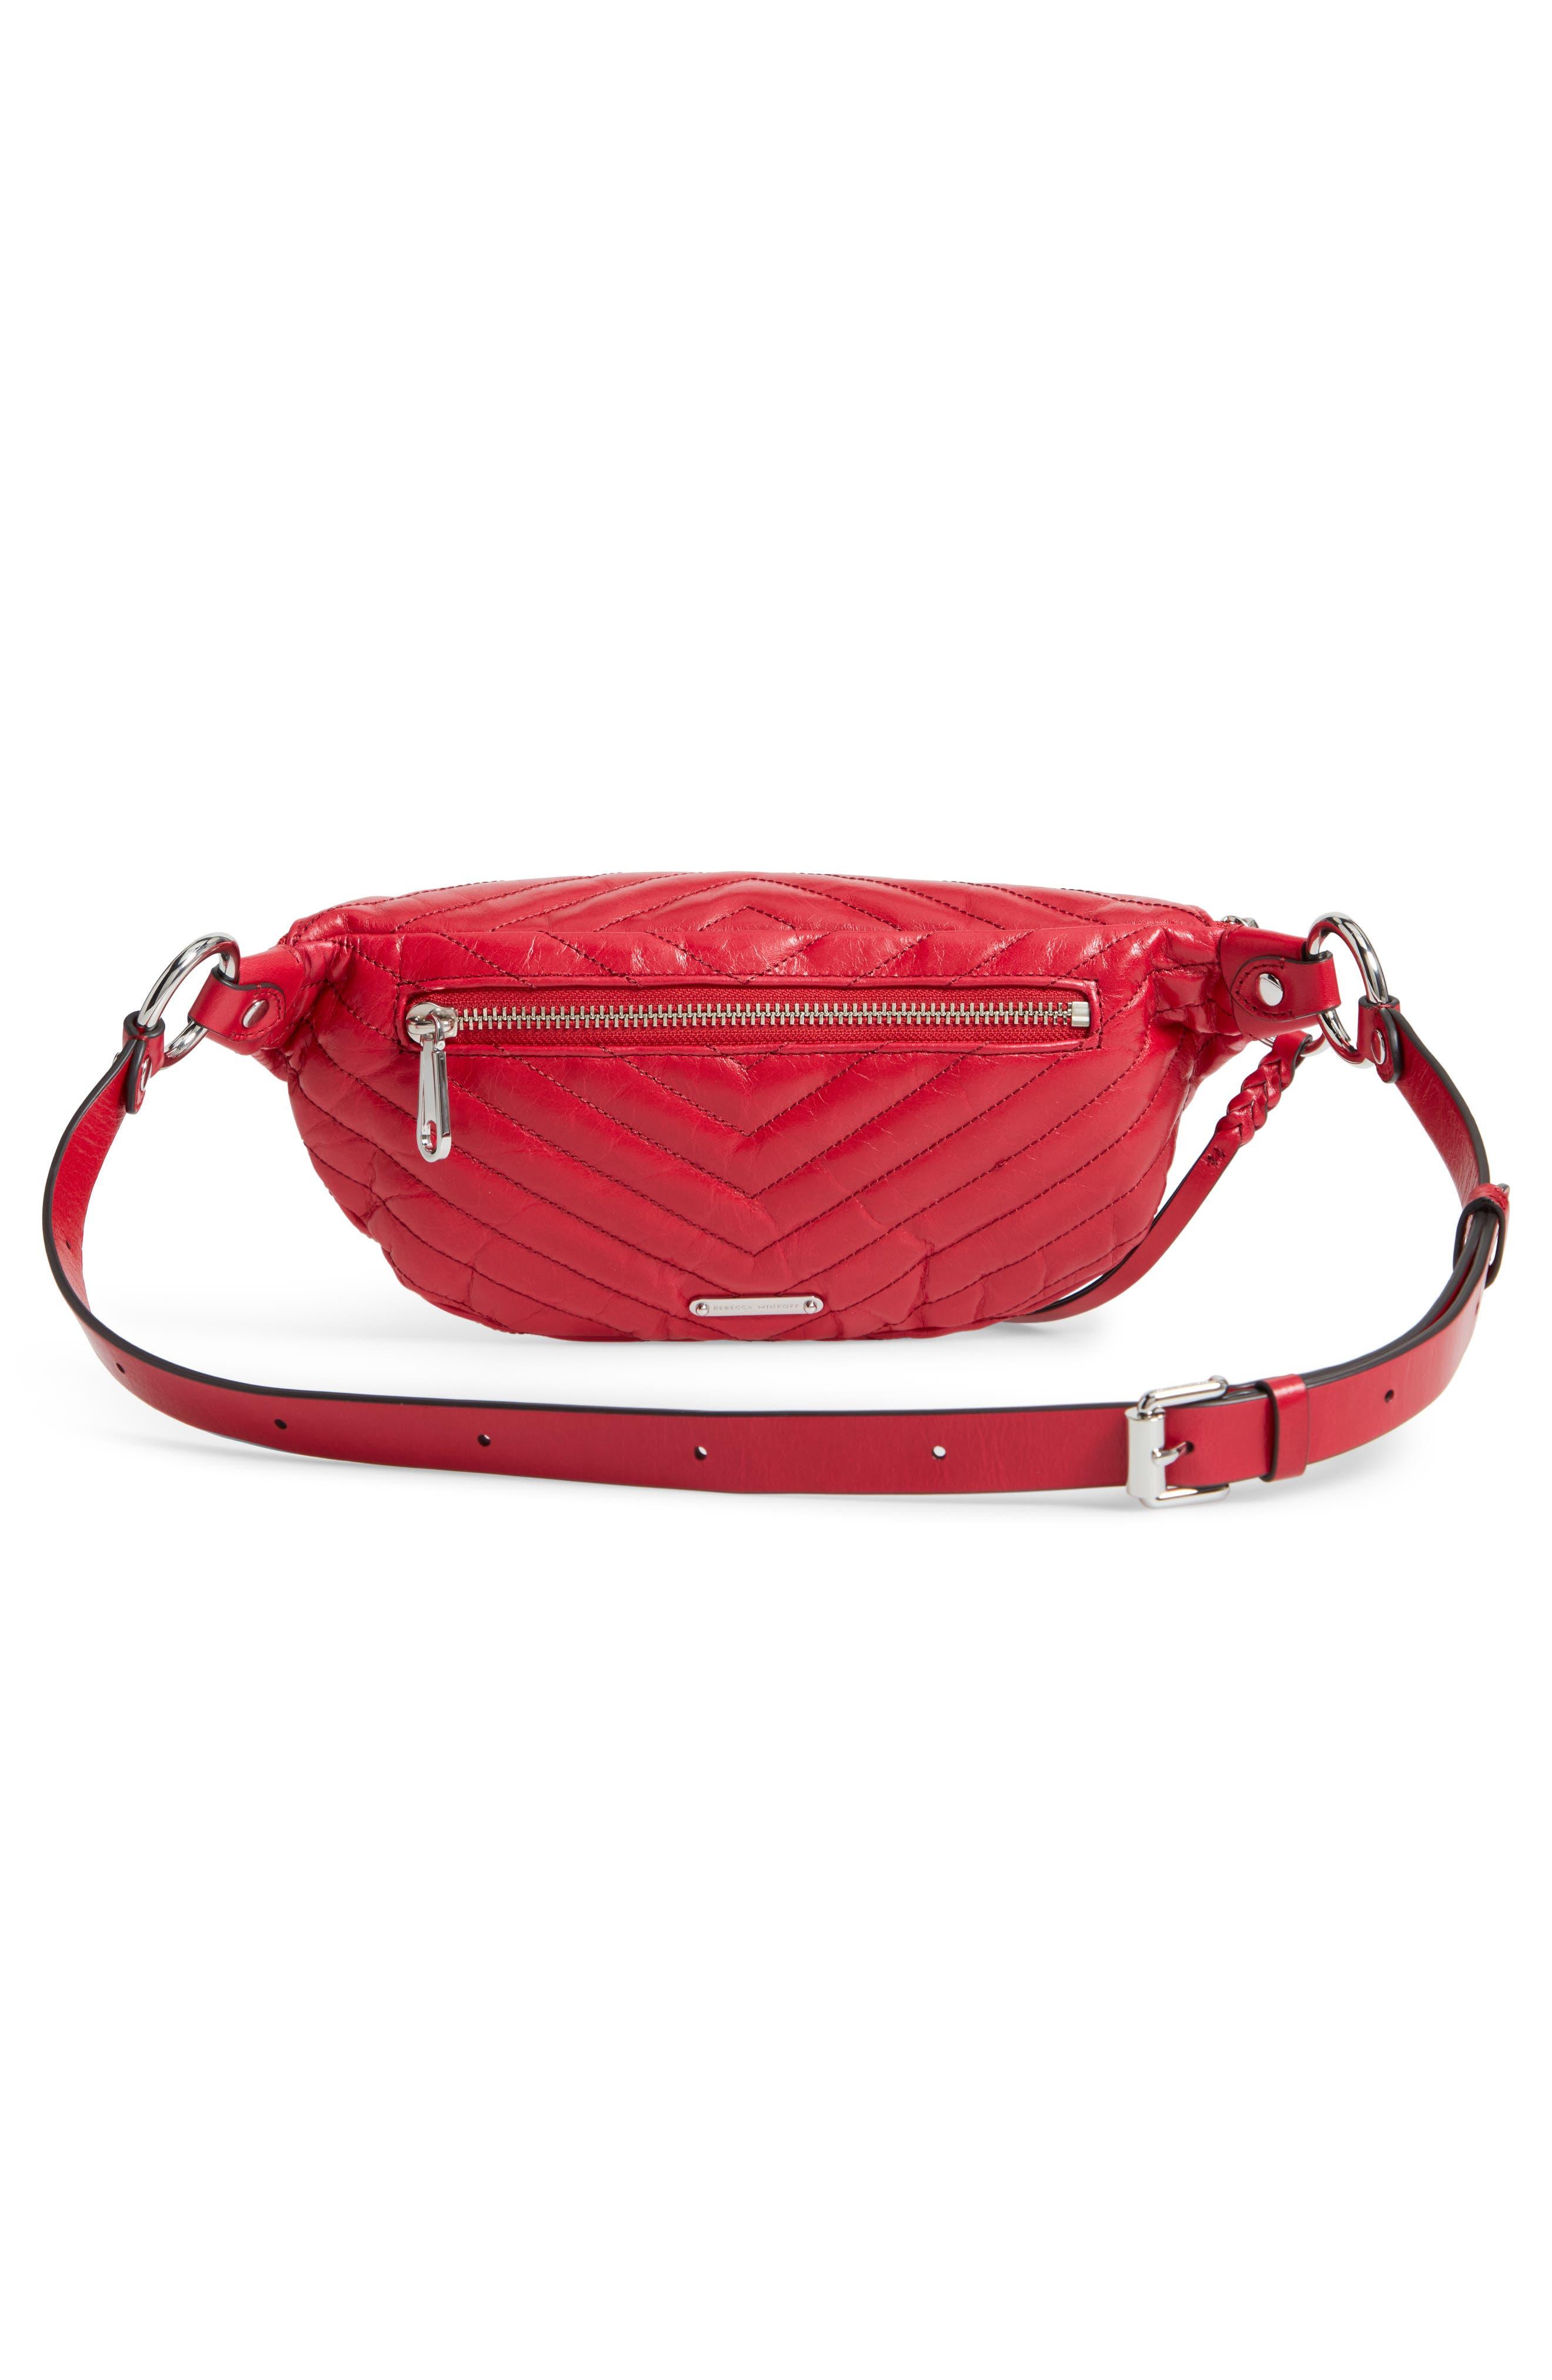 REBECCA MINKOFF, Edie Leather Belt Bag, Alternate thumbnail 5, color, 600